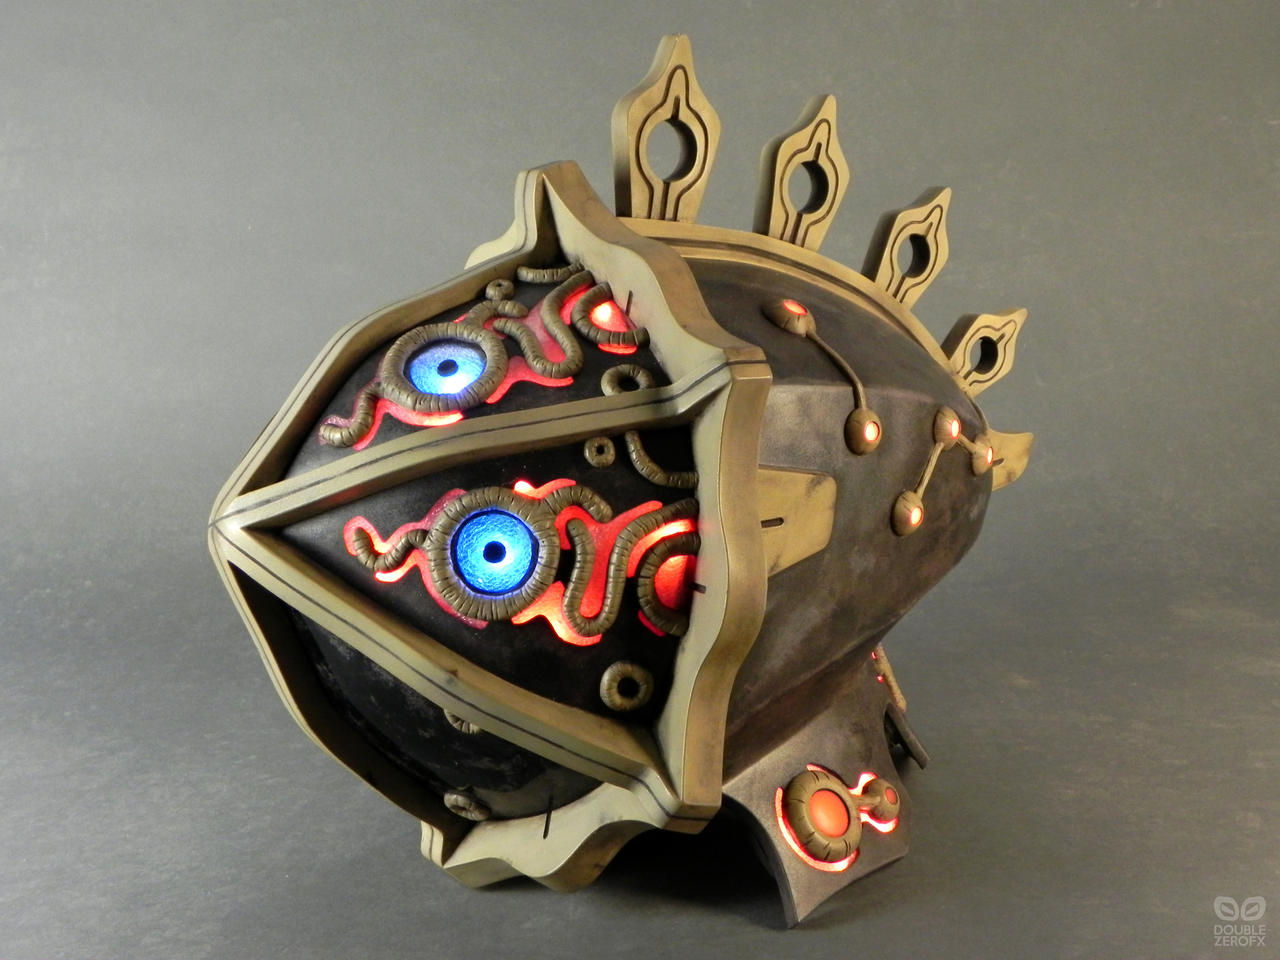 Breath of the Wild: Vah Rudania Divine Helm